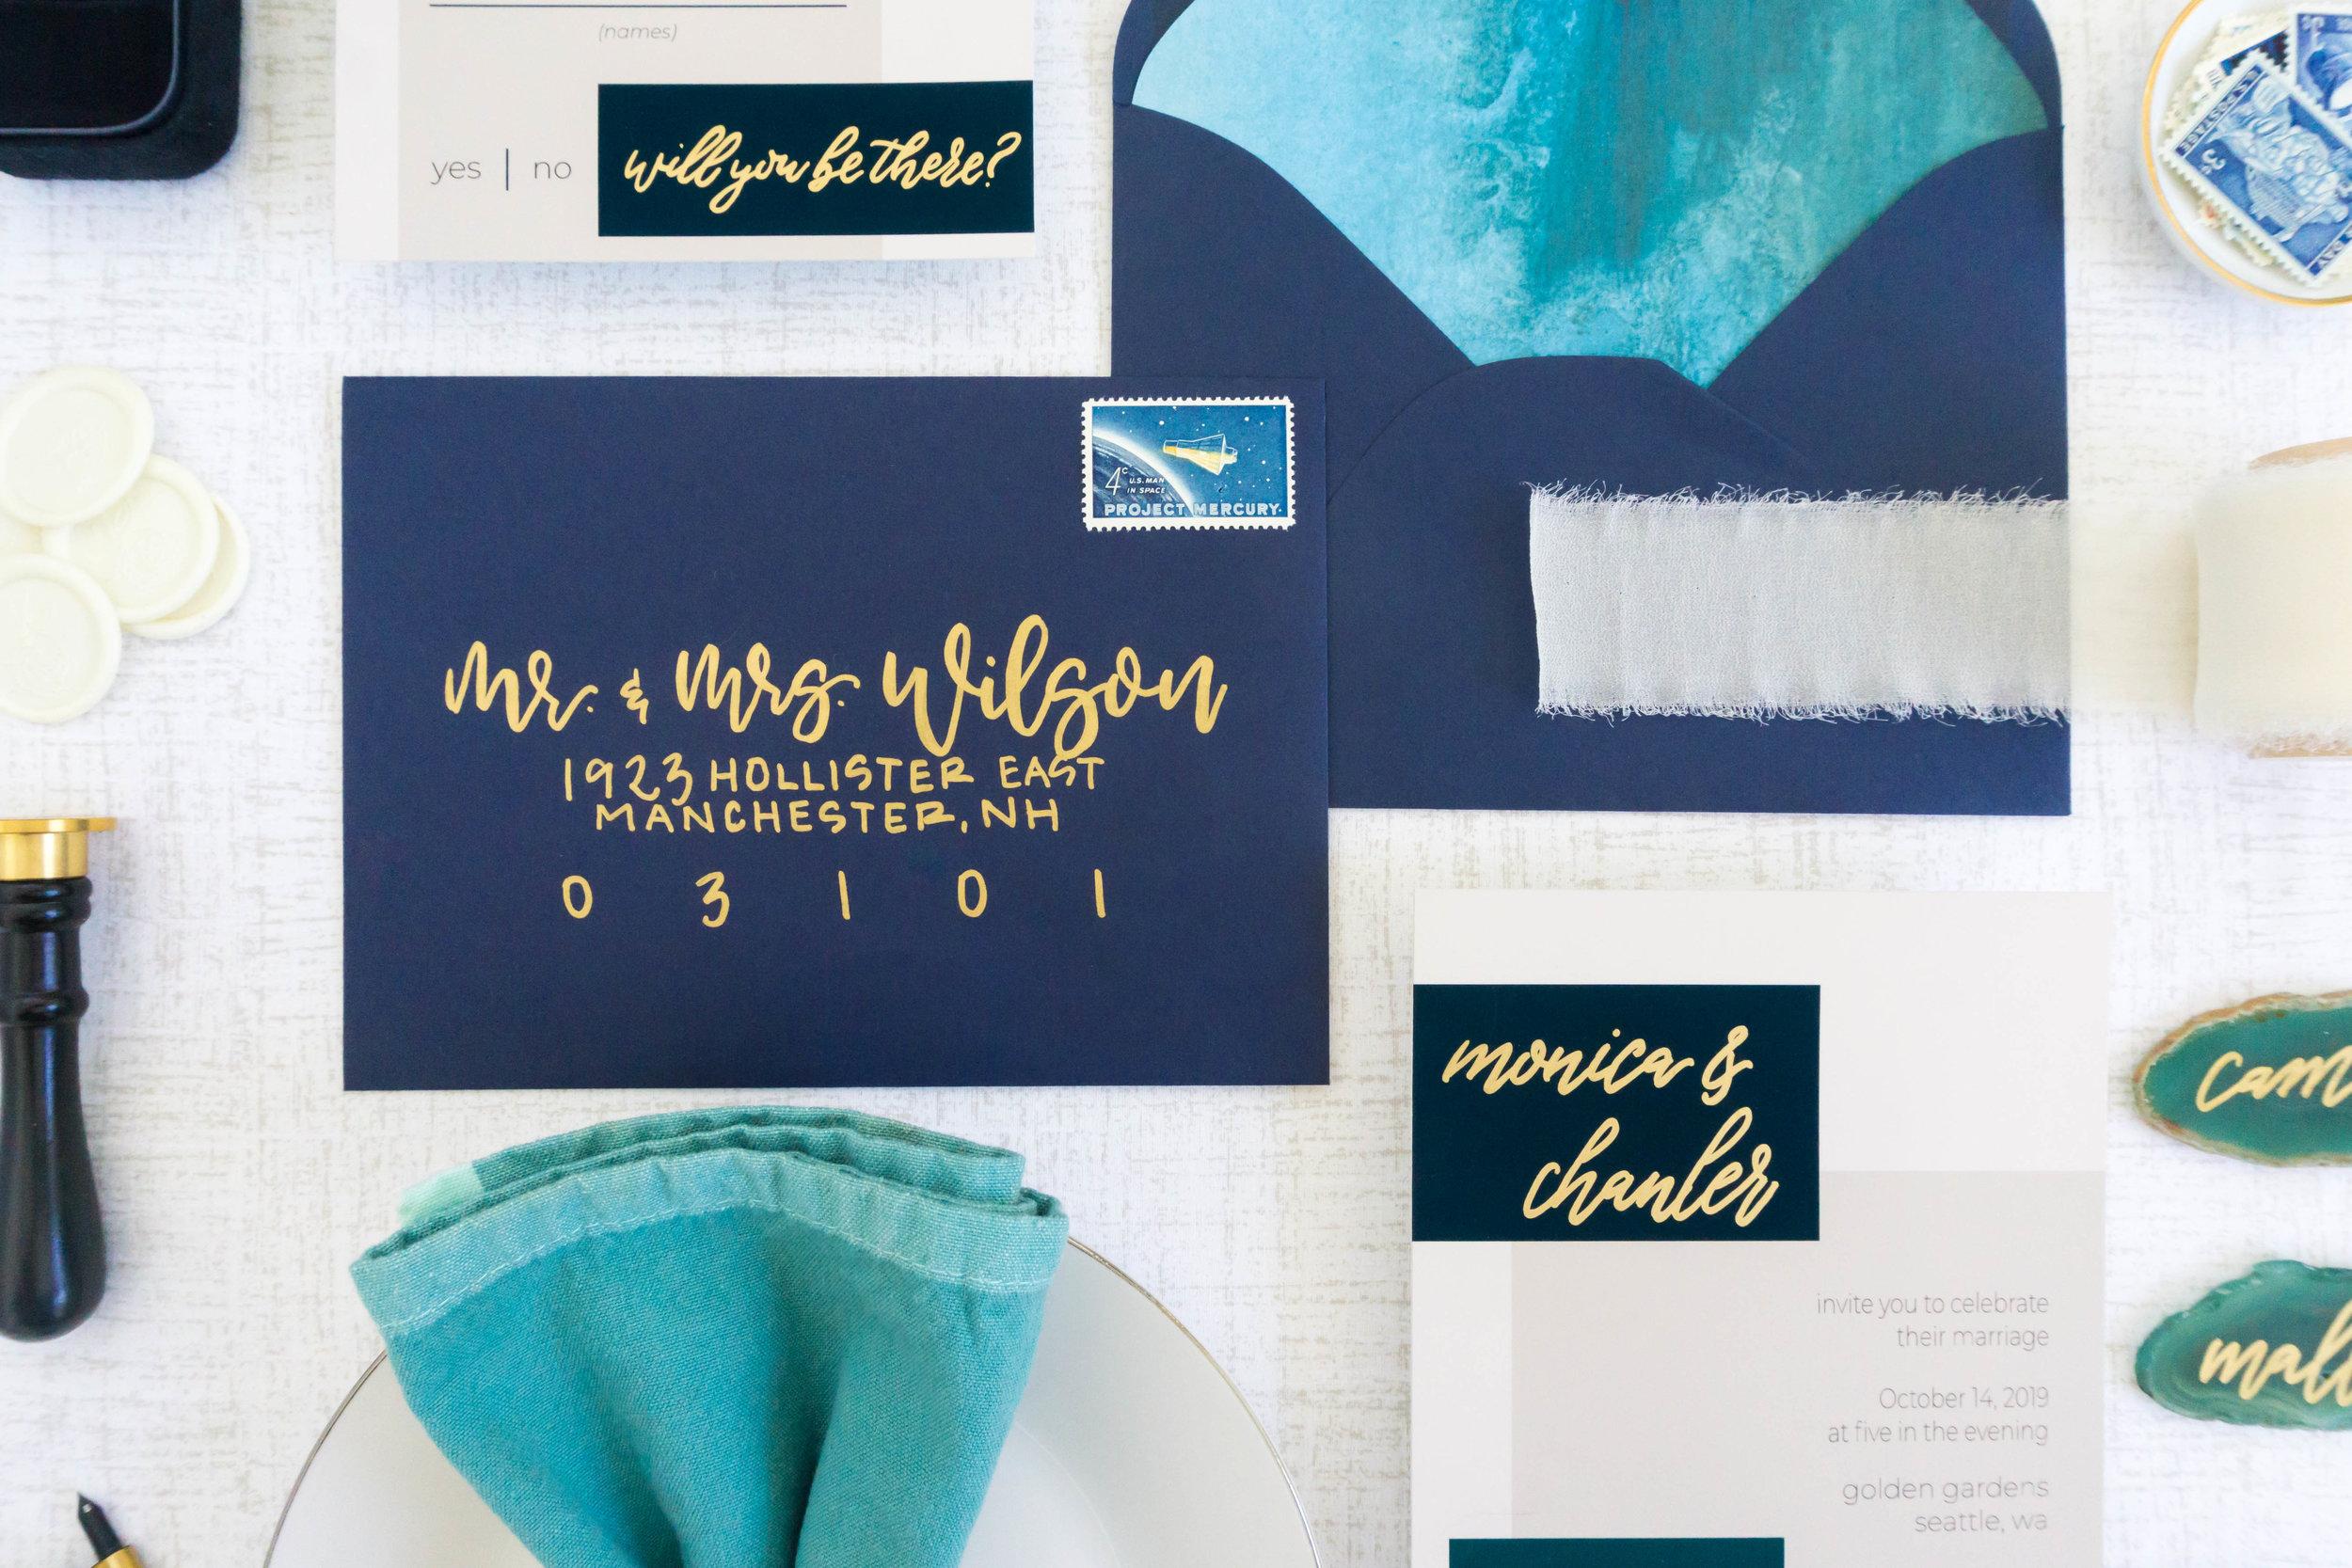 love-fern-design-studio-custom-wedding-invitations-for-the-modern-couple-modern-calligraphy-in-seattle-washington-custom-wedding-stationery17.jpg